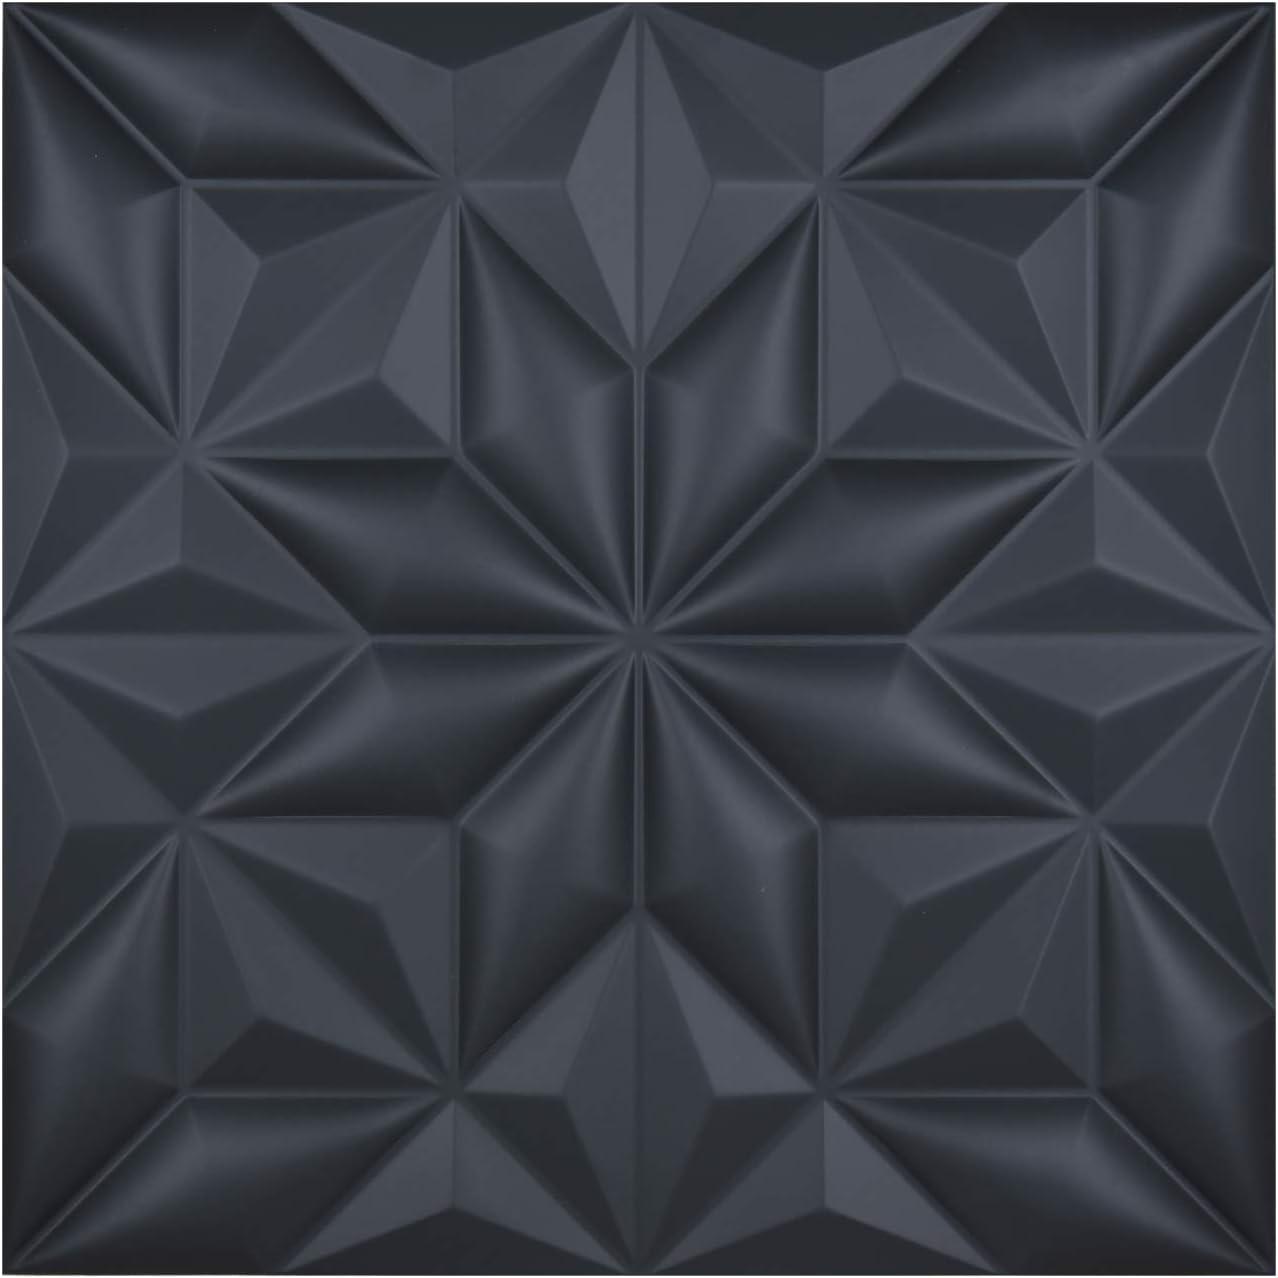 "Art3d 3D Leather Tiles Decoartive 3D Wall Panels, Black Pyramid 23.6"" x 23.6"" (6 Pack)"